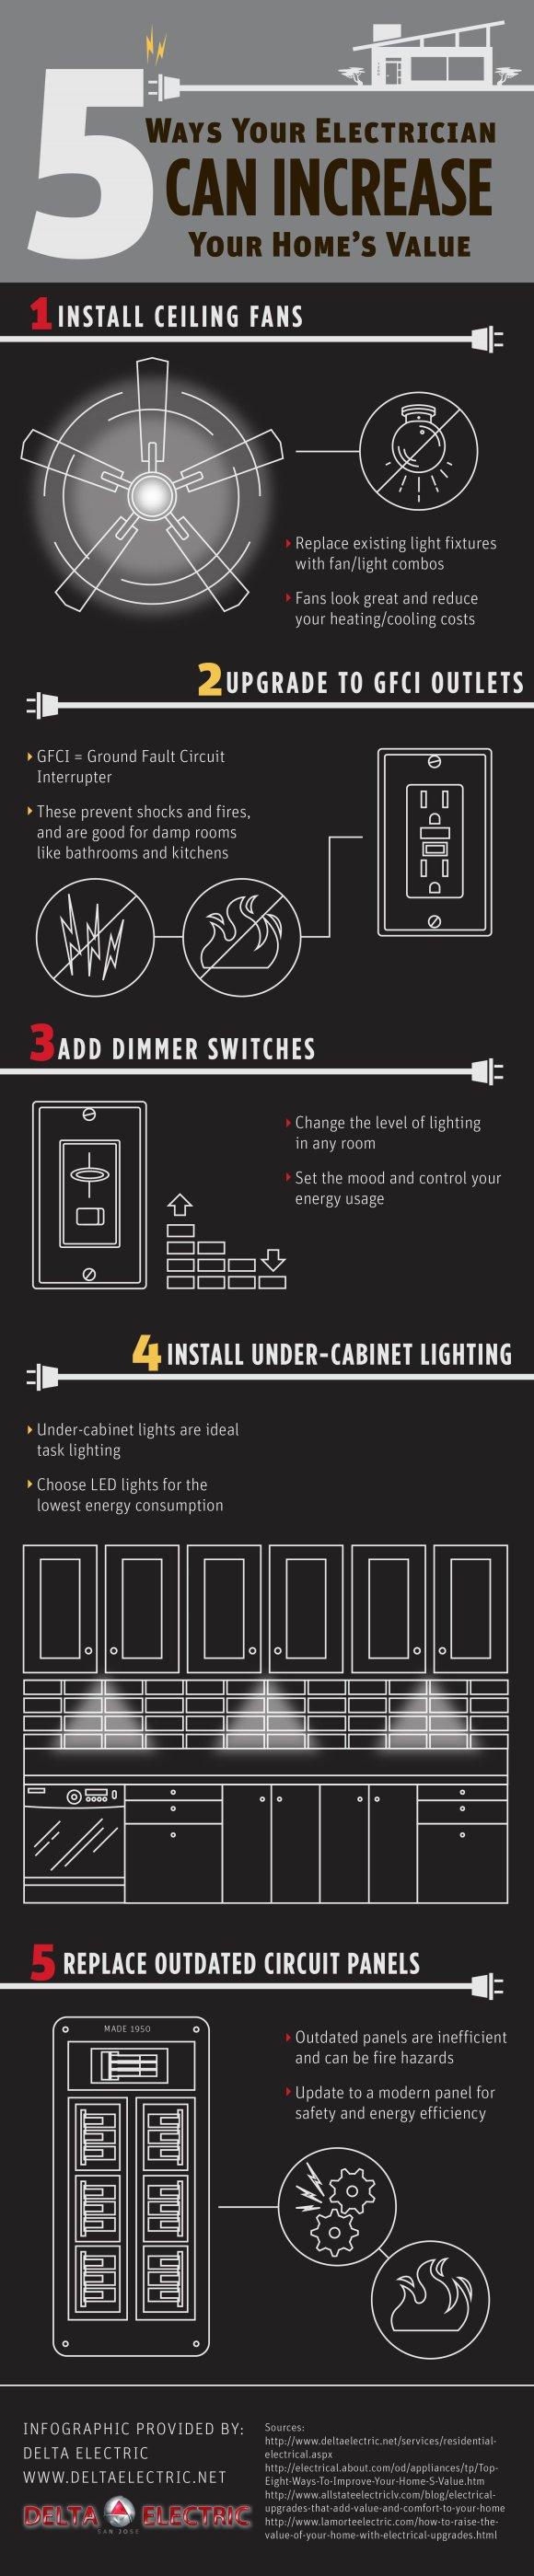 Data Electric Info graphics